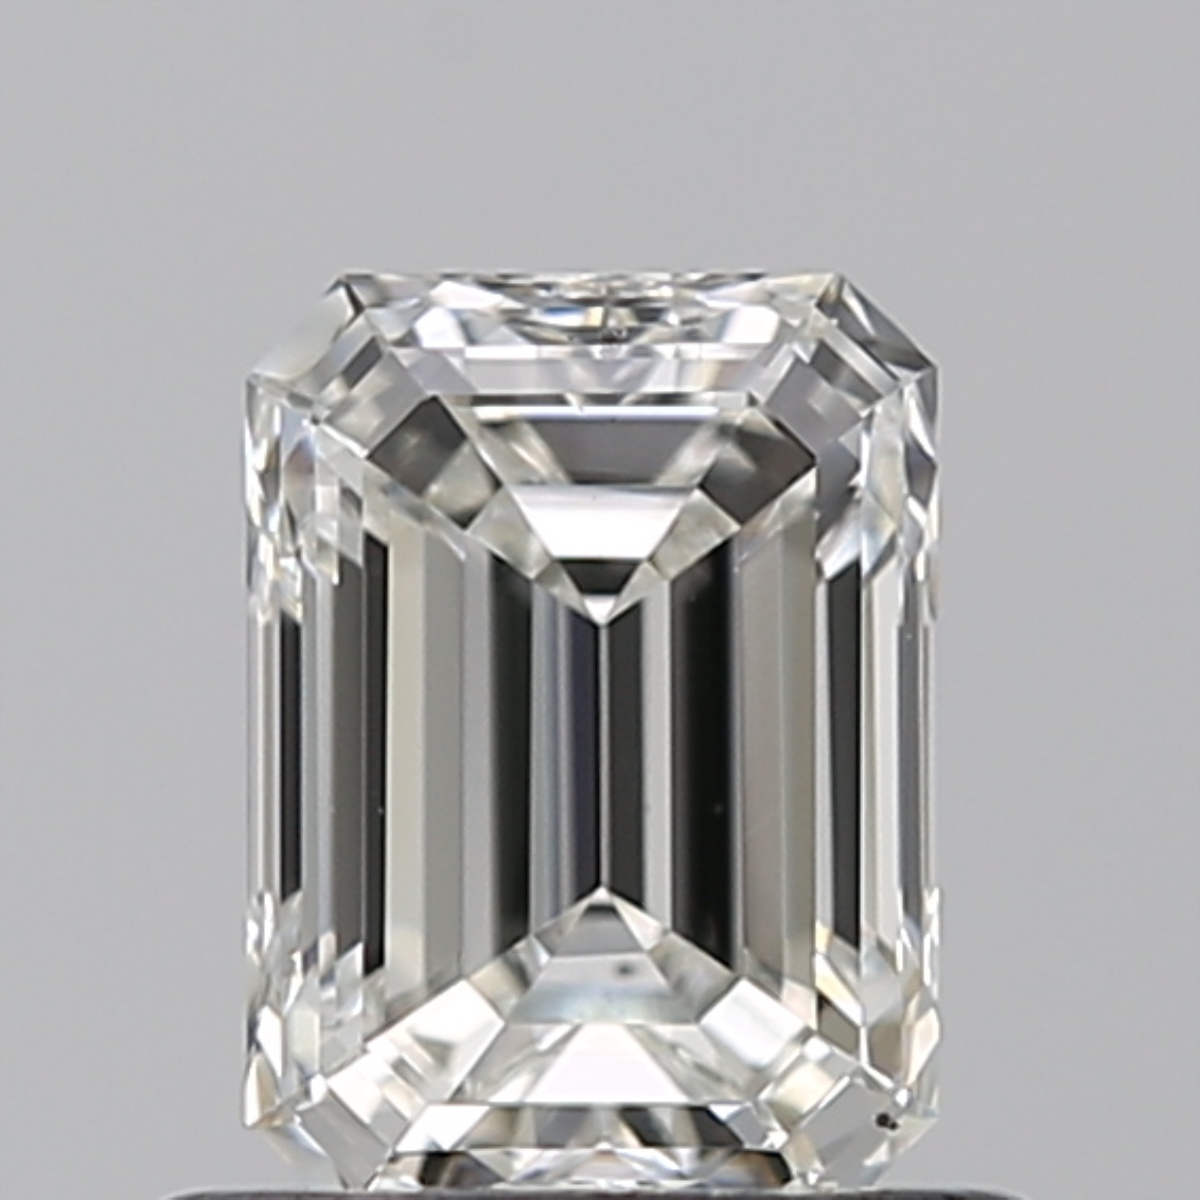 0.70 ct Emerald Cut Diamond : G / VS2